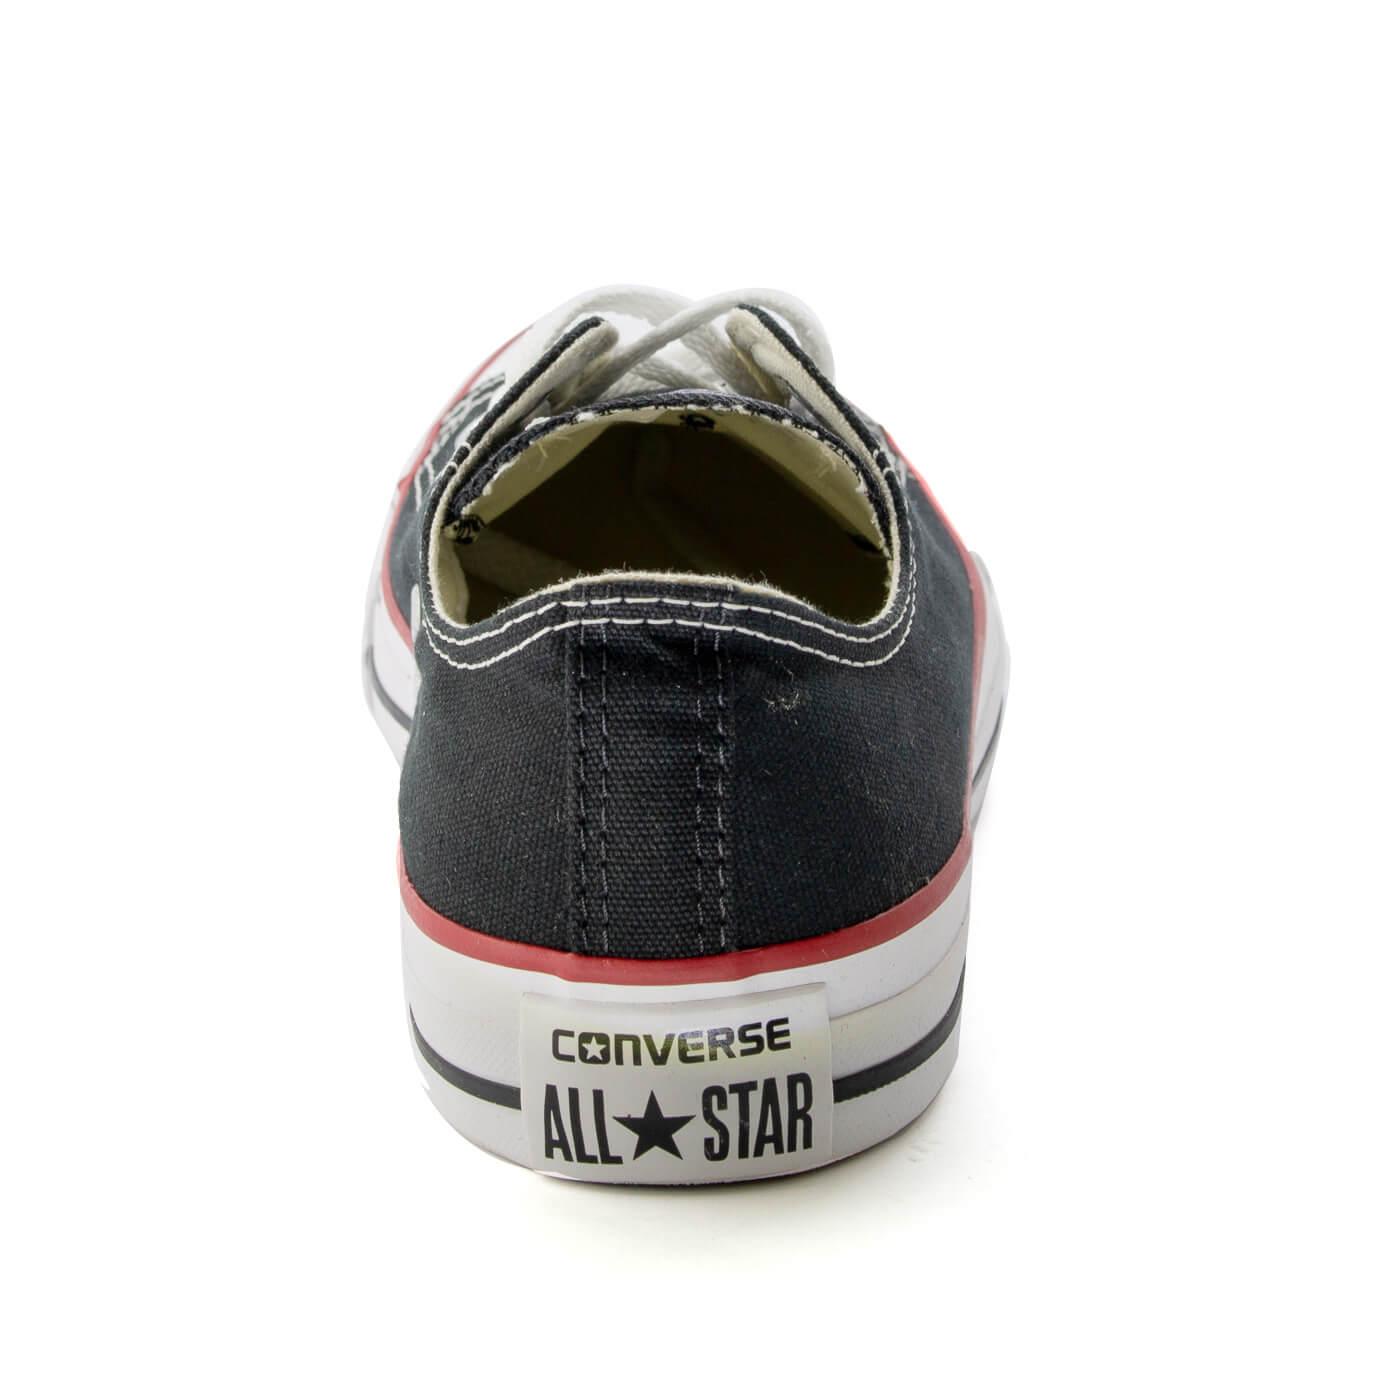 TENIS INFANTIL CHUCK TAYLOR CONVERSE ALL STAR CORE BORDER - CK0505